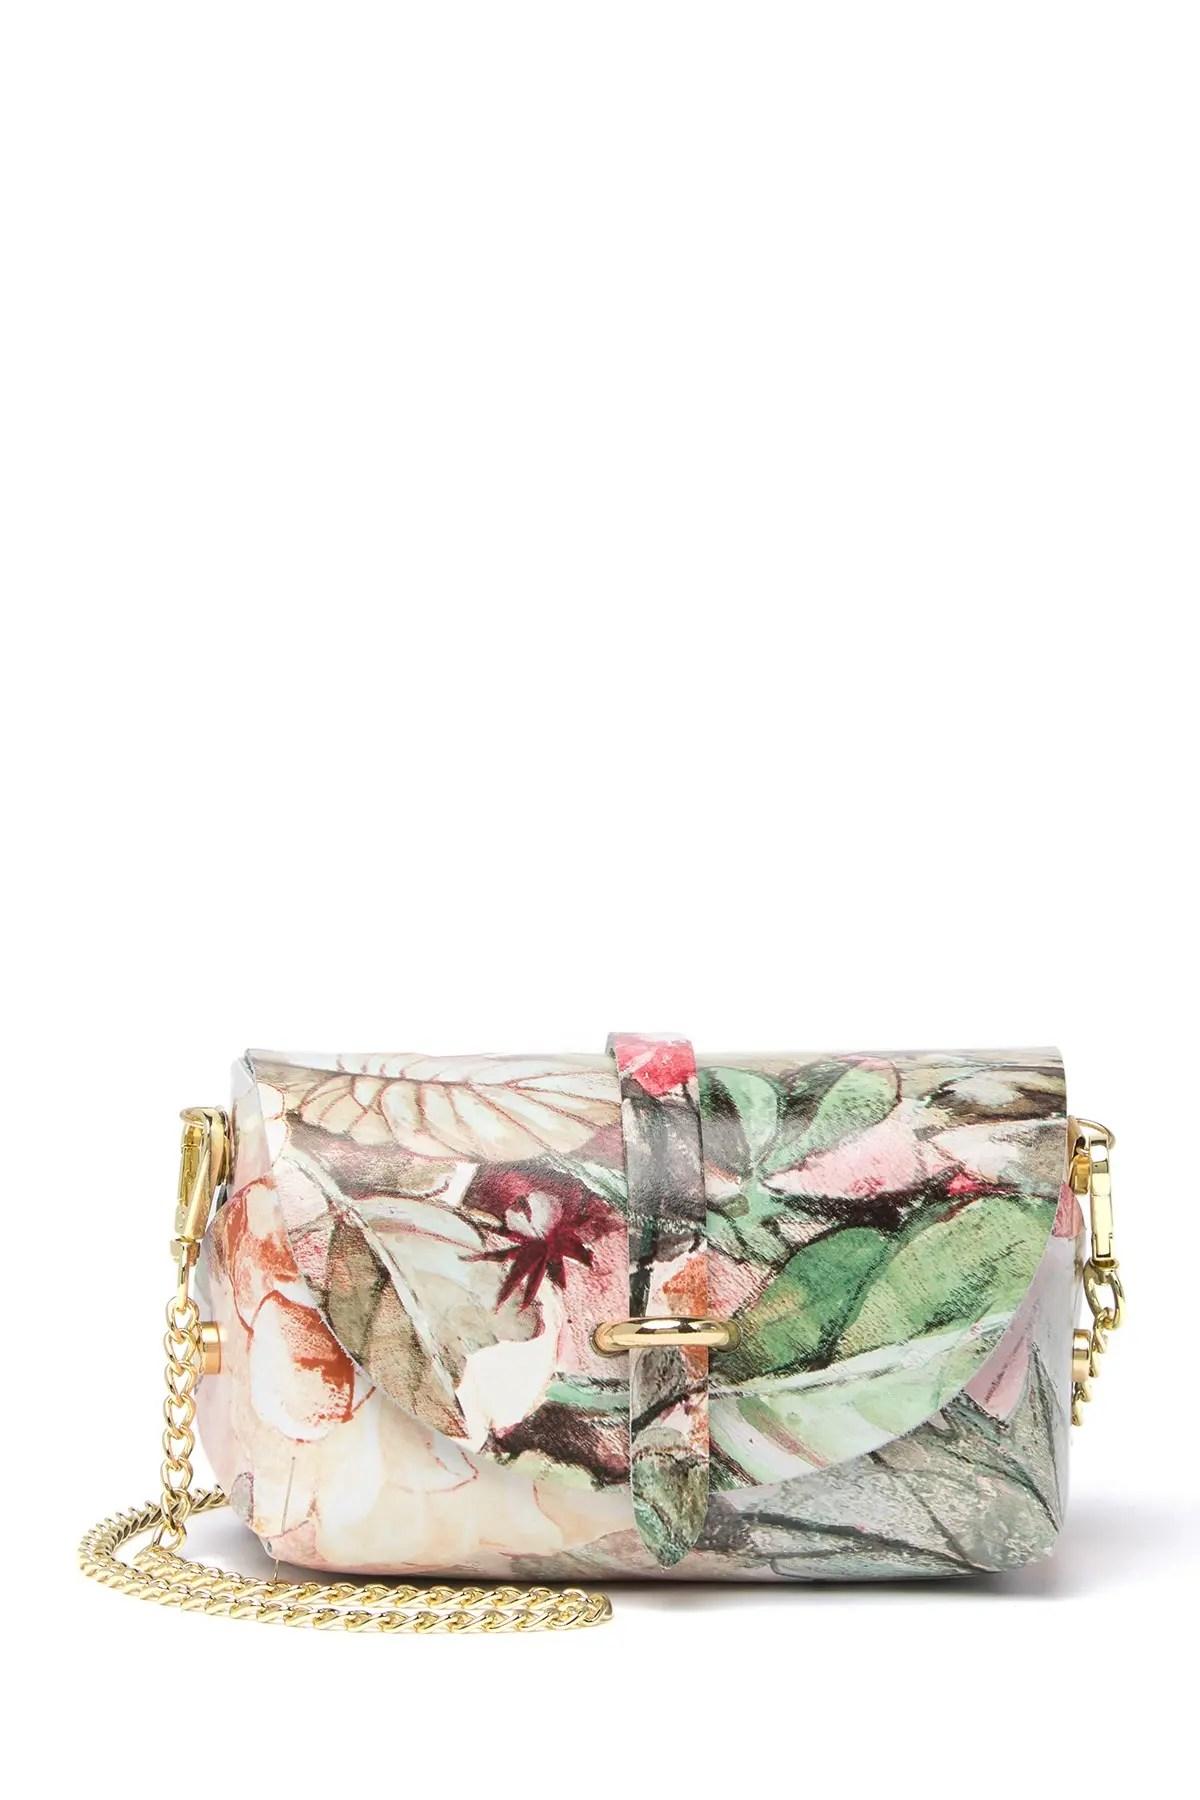 sofia cardoni floral leather clutch nordstrom rack